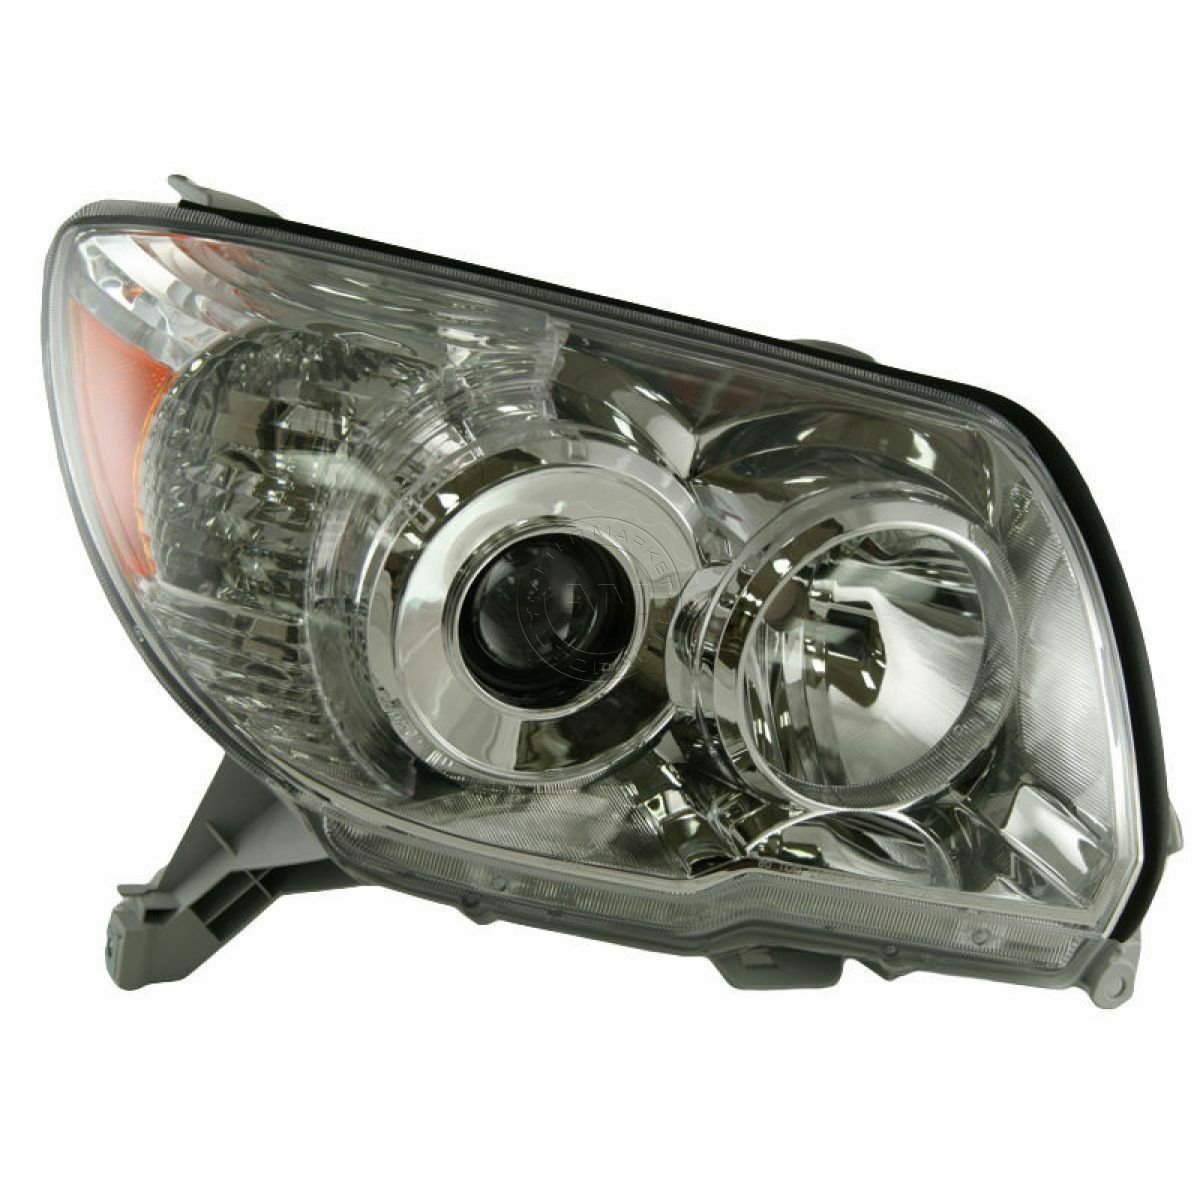 Headlight Headlamp Passenger Side Right RH for 99-01 Hyundai Sonata